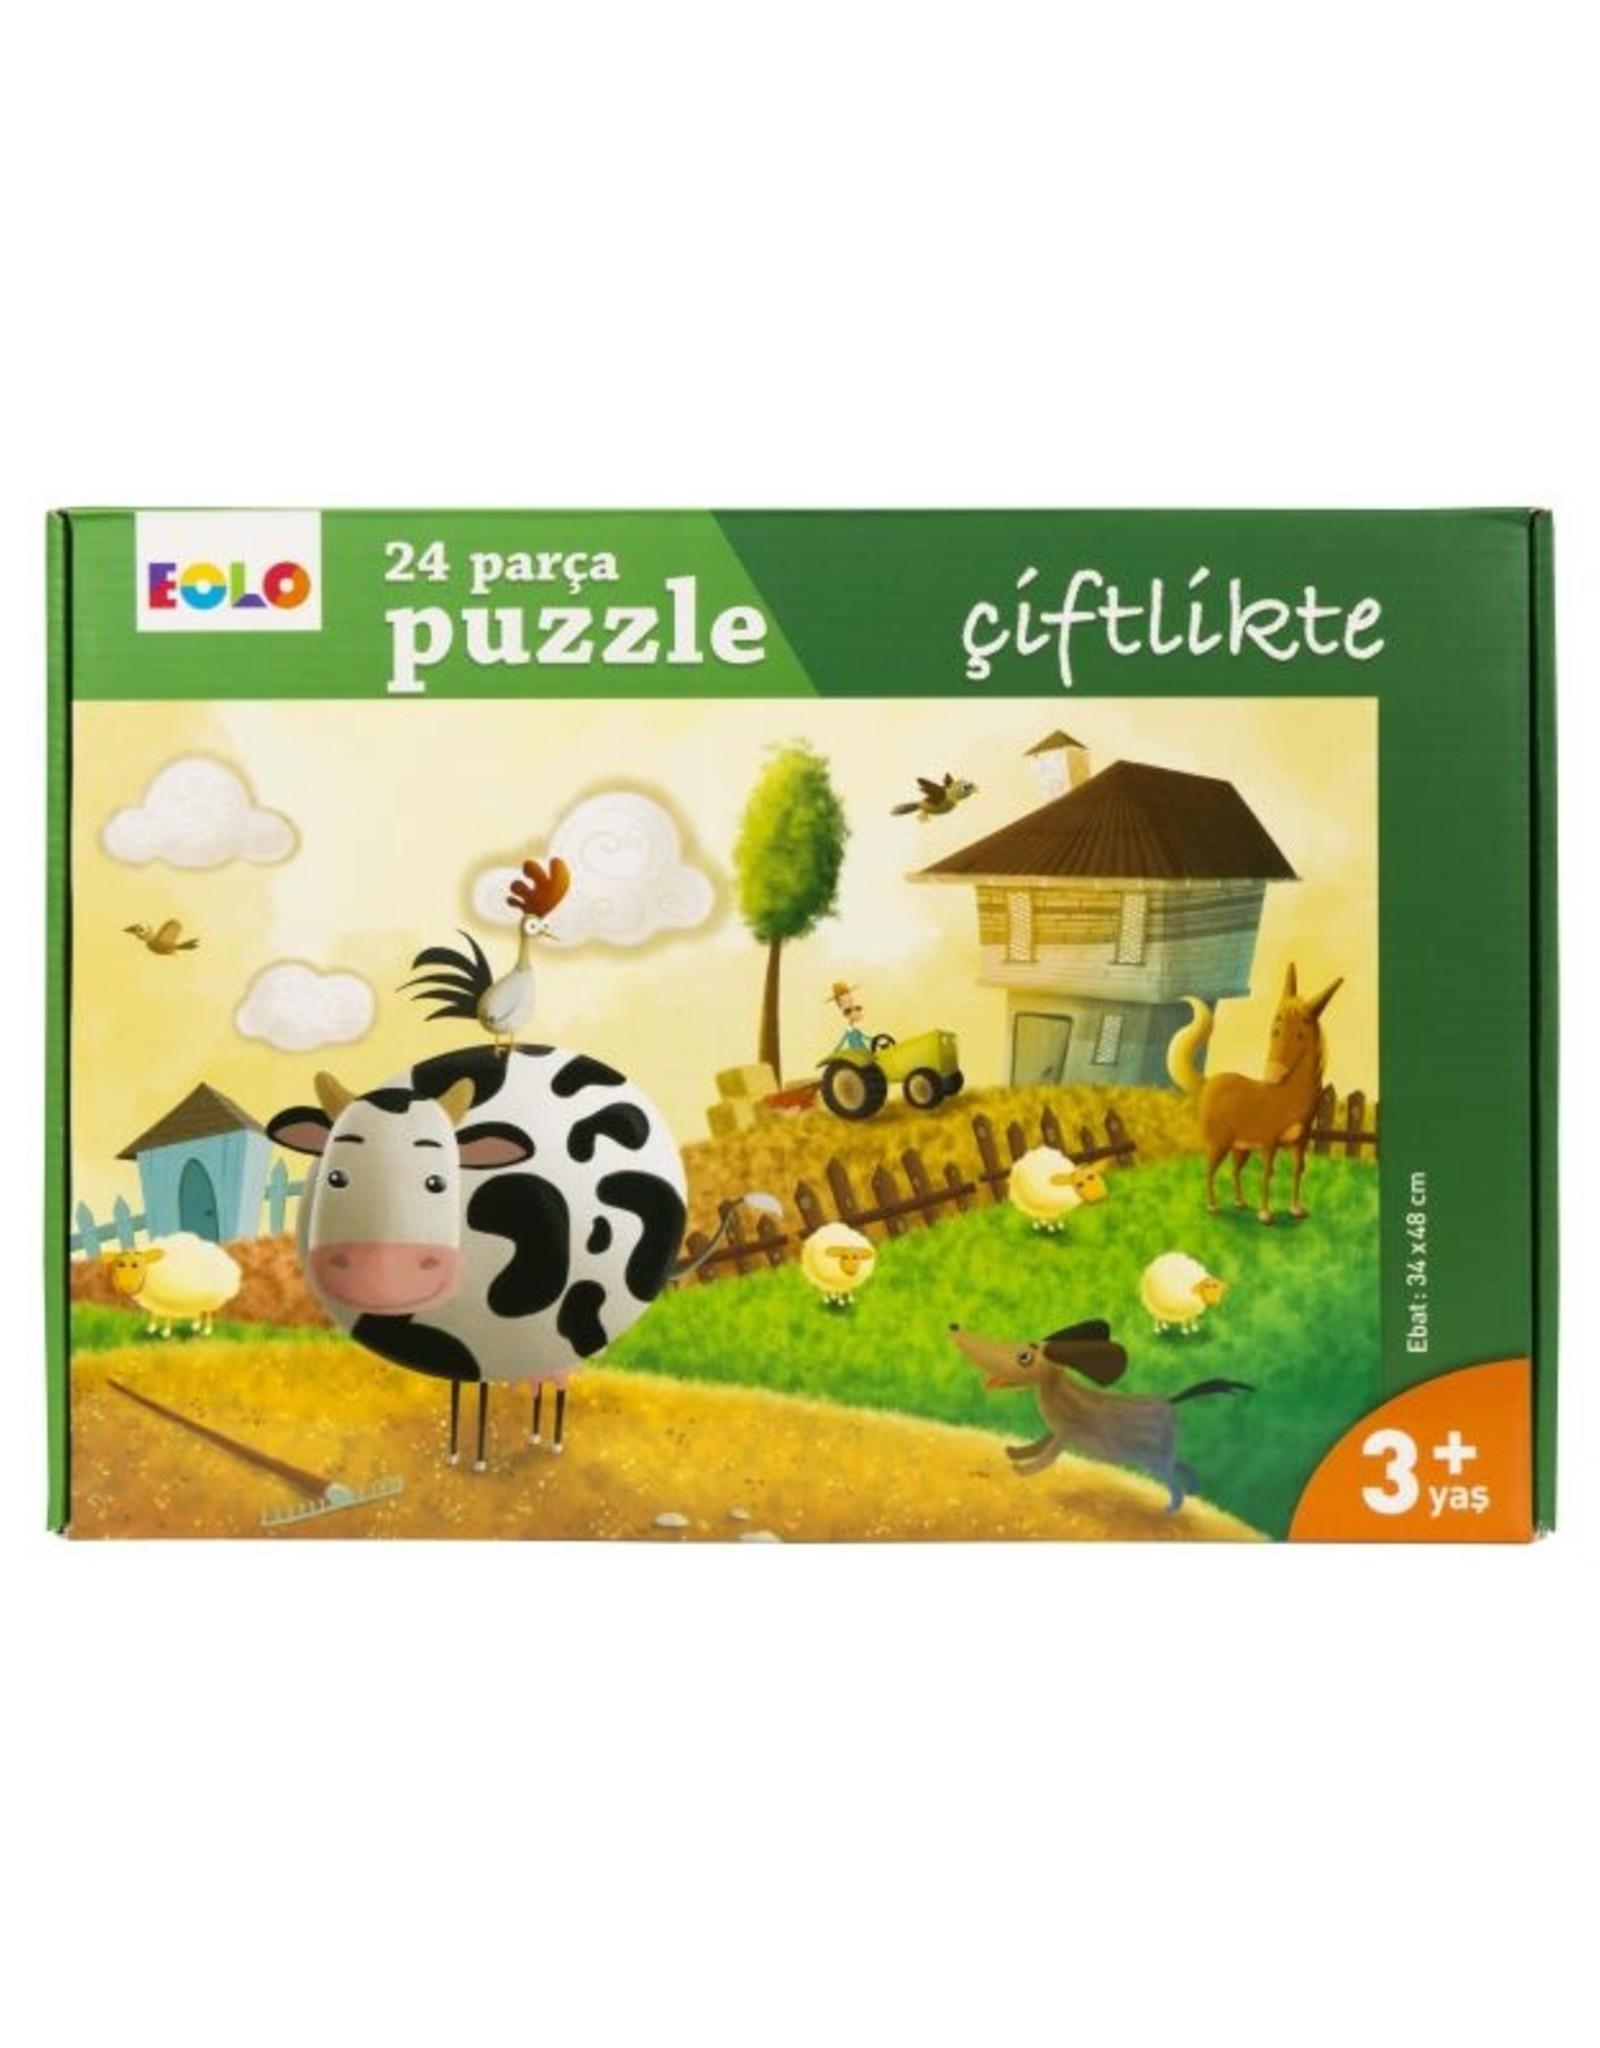 24 Parça Puzzle Çiftlikte